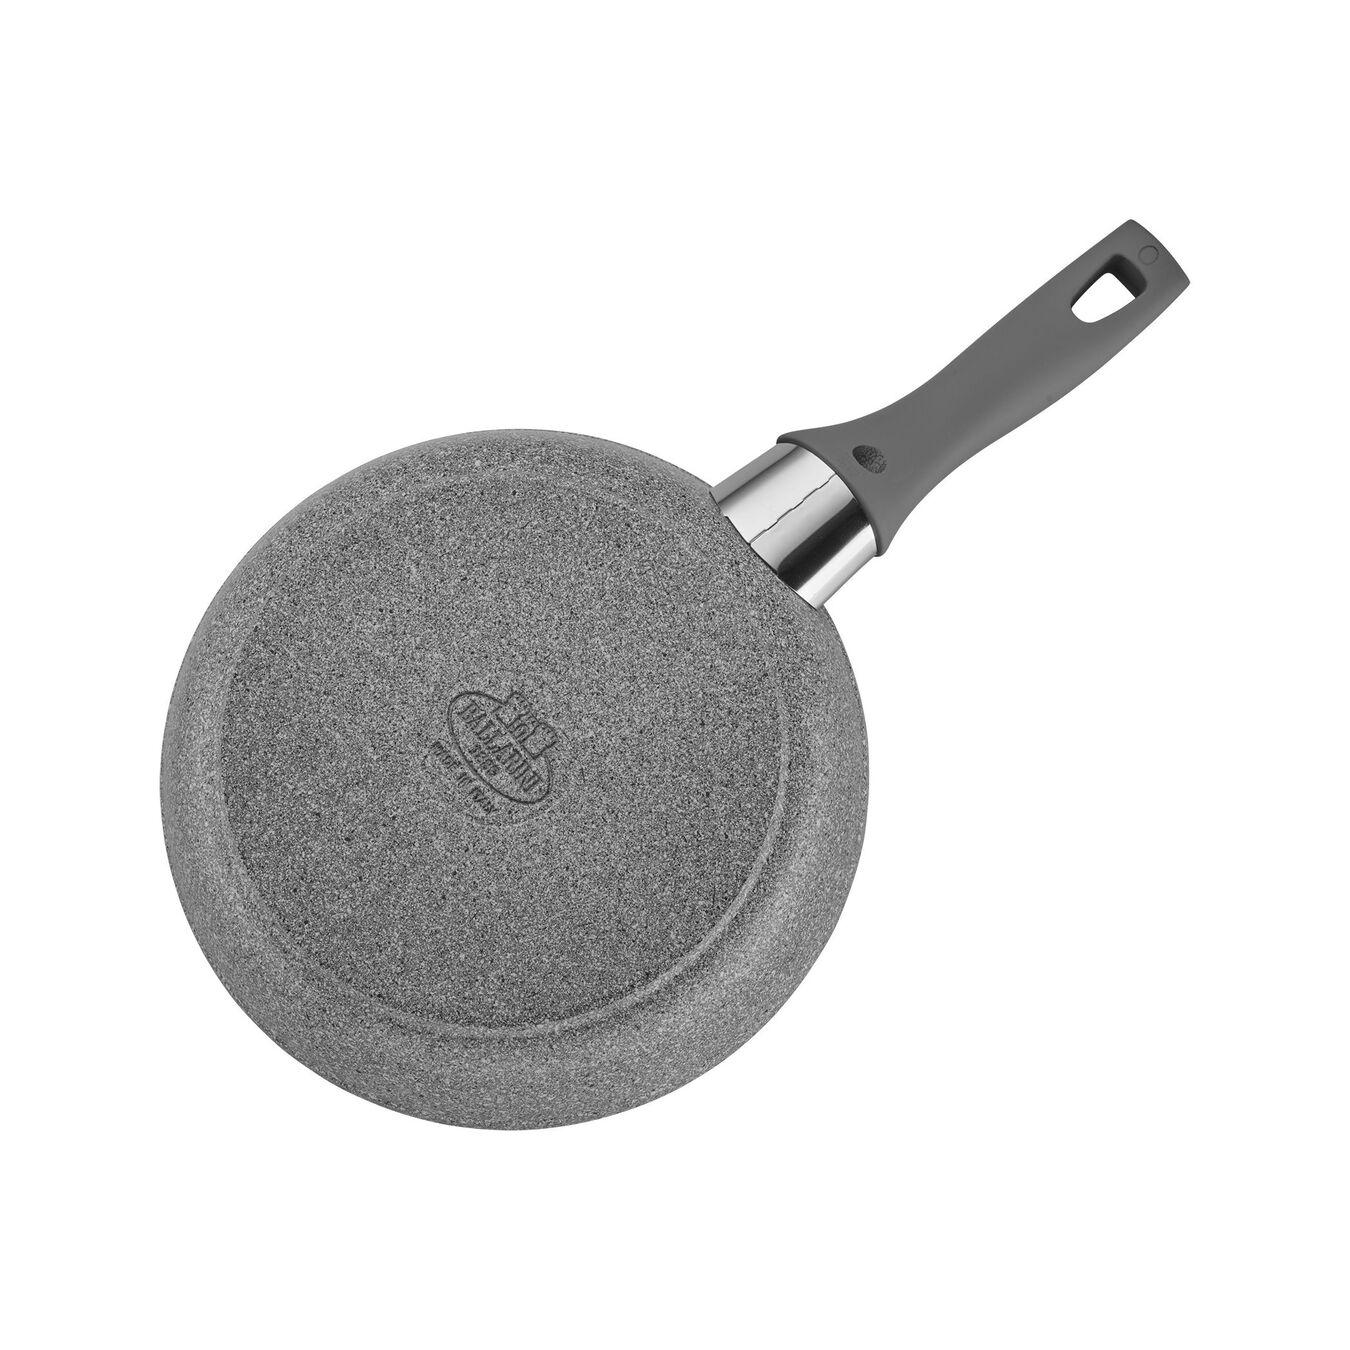 8-inch, Frying pan,,large 3